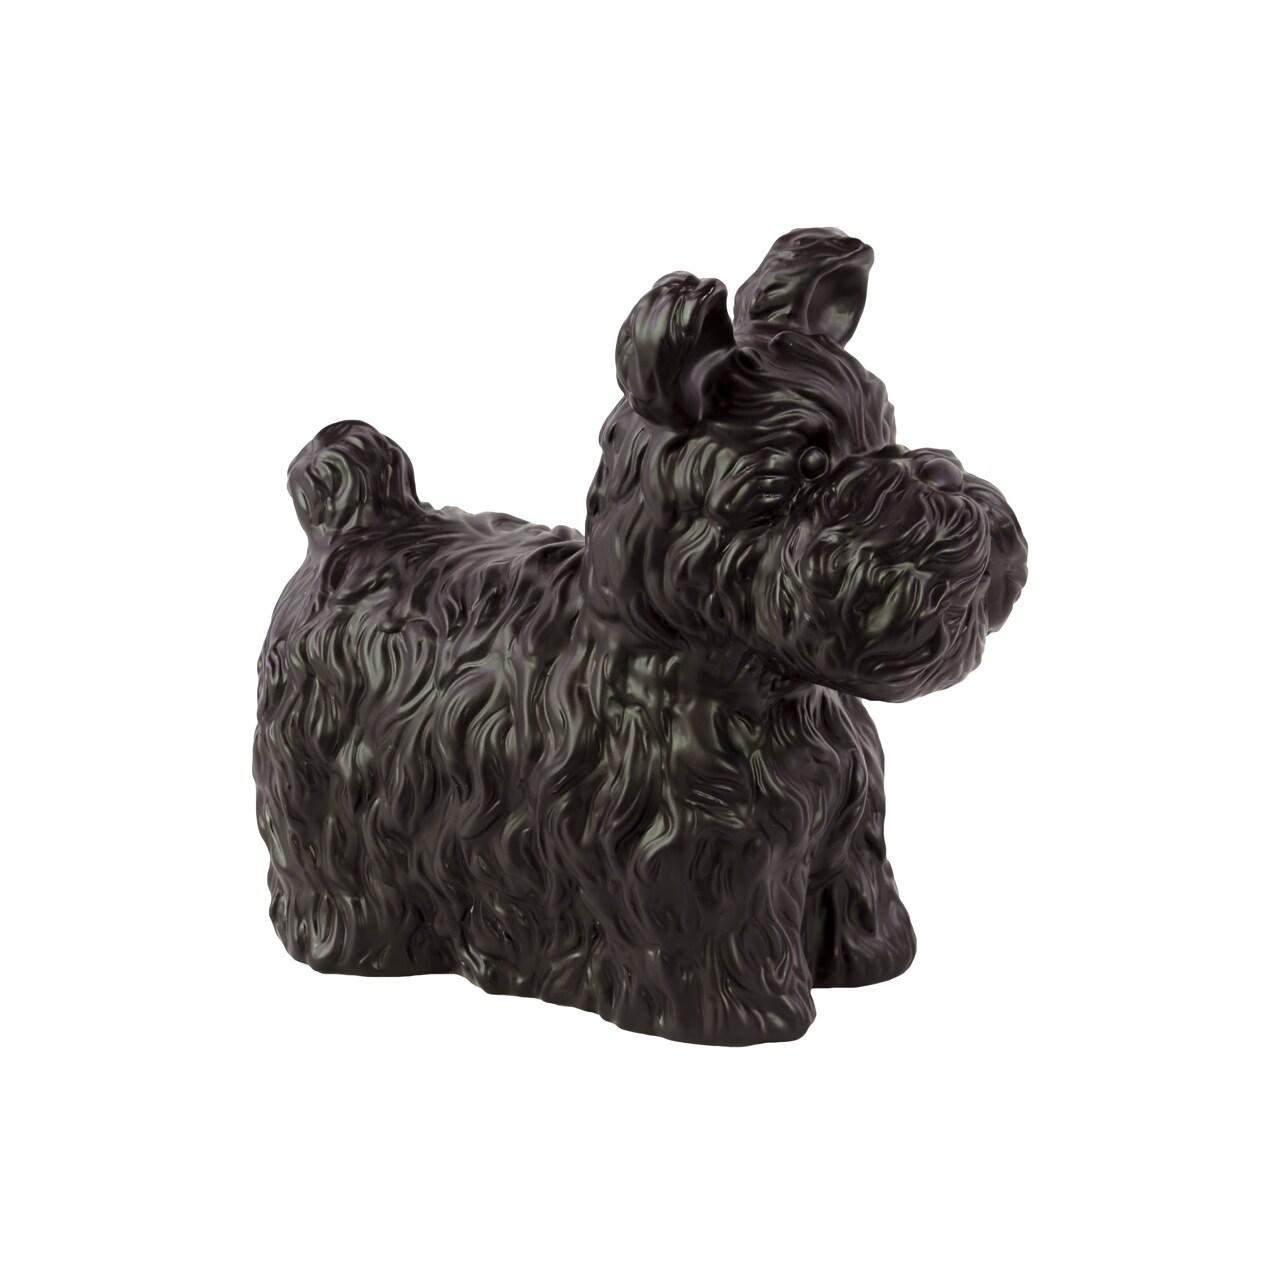 Matte Black Ceramic Dog (Ceramic Dog Matte Black)